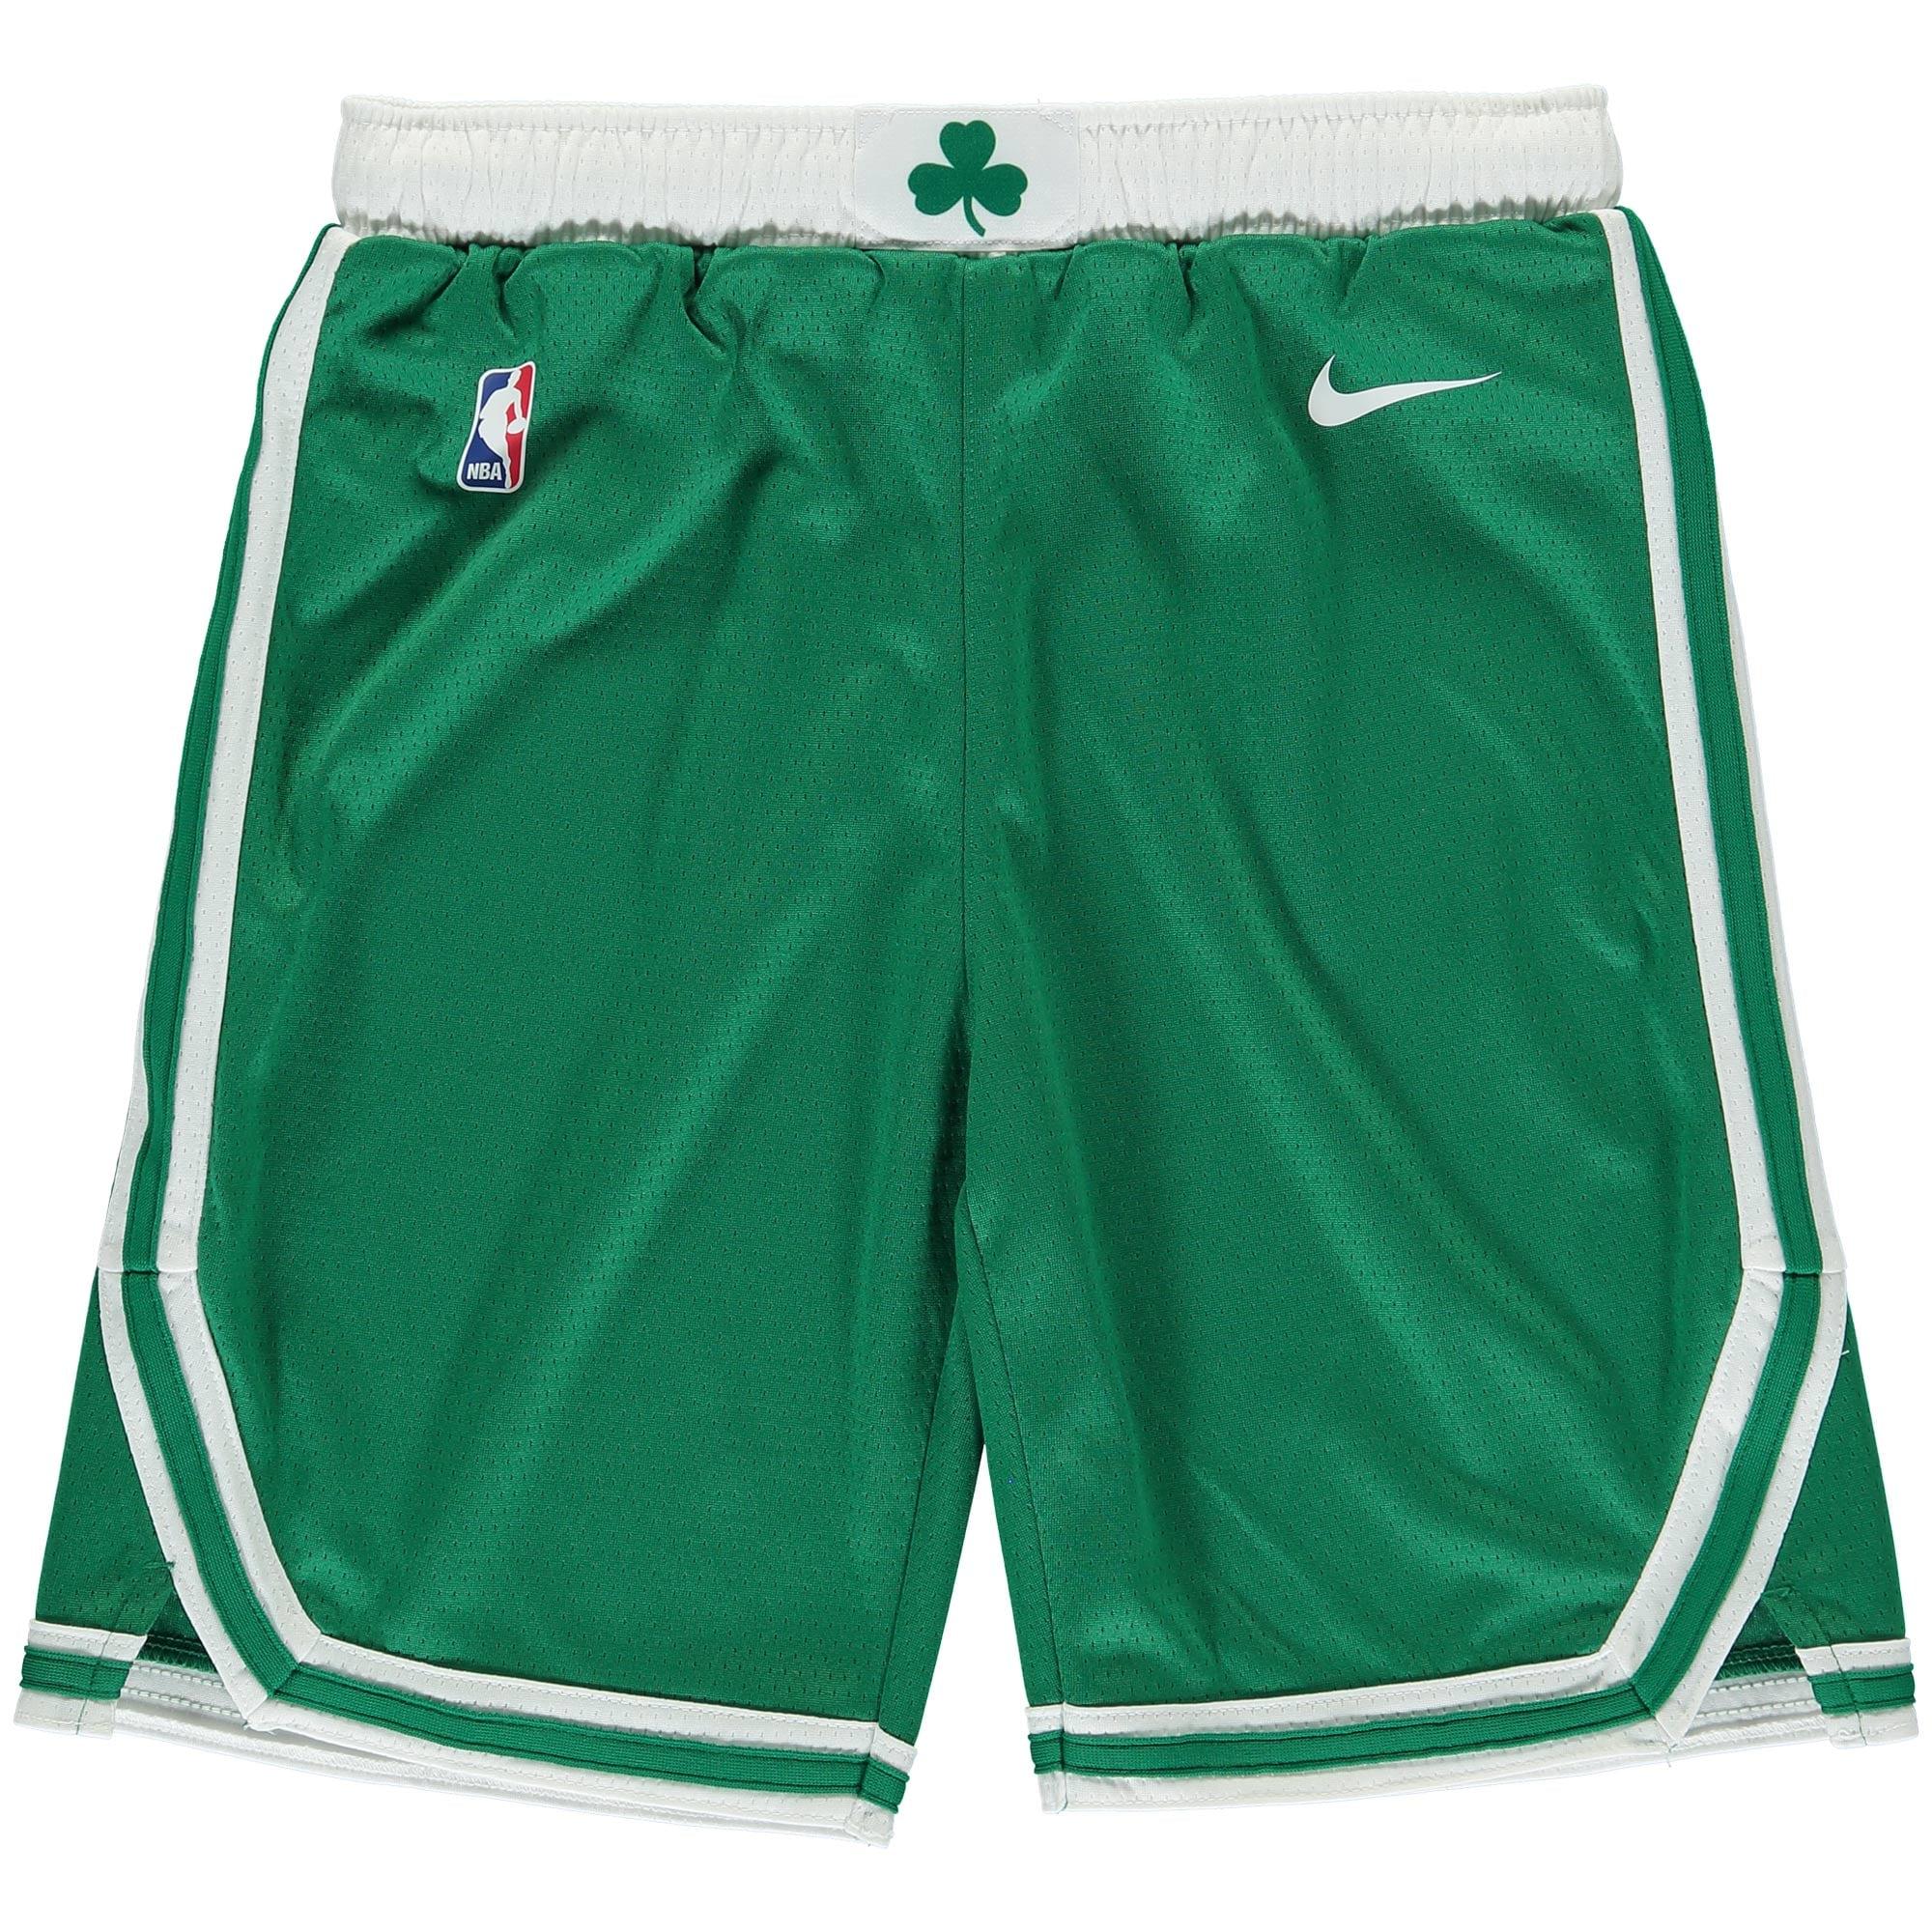 Boston Celtics Nike Youth Swingman Icon Performance Shorts - Kelly Green/White